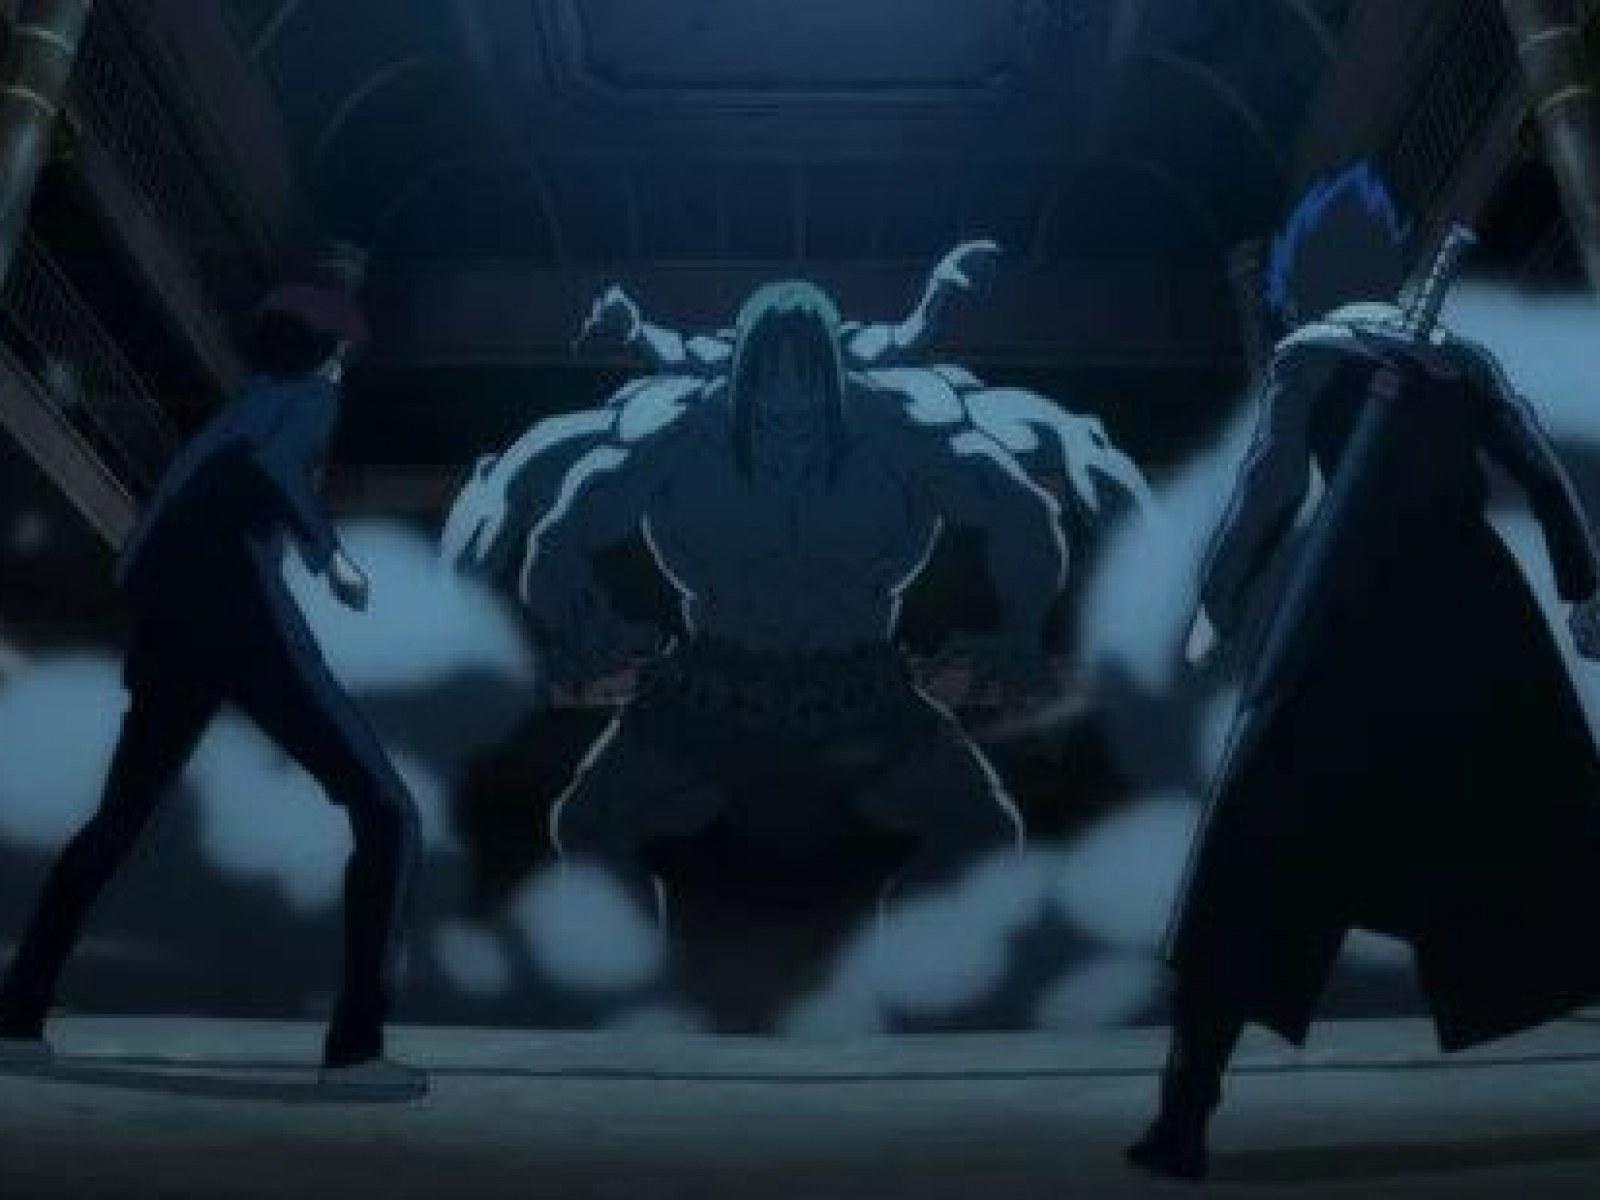 New Yu Yu Hakusho Anime Screenshots Give First Look At Yusuke